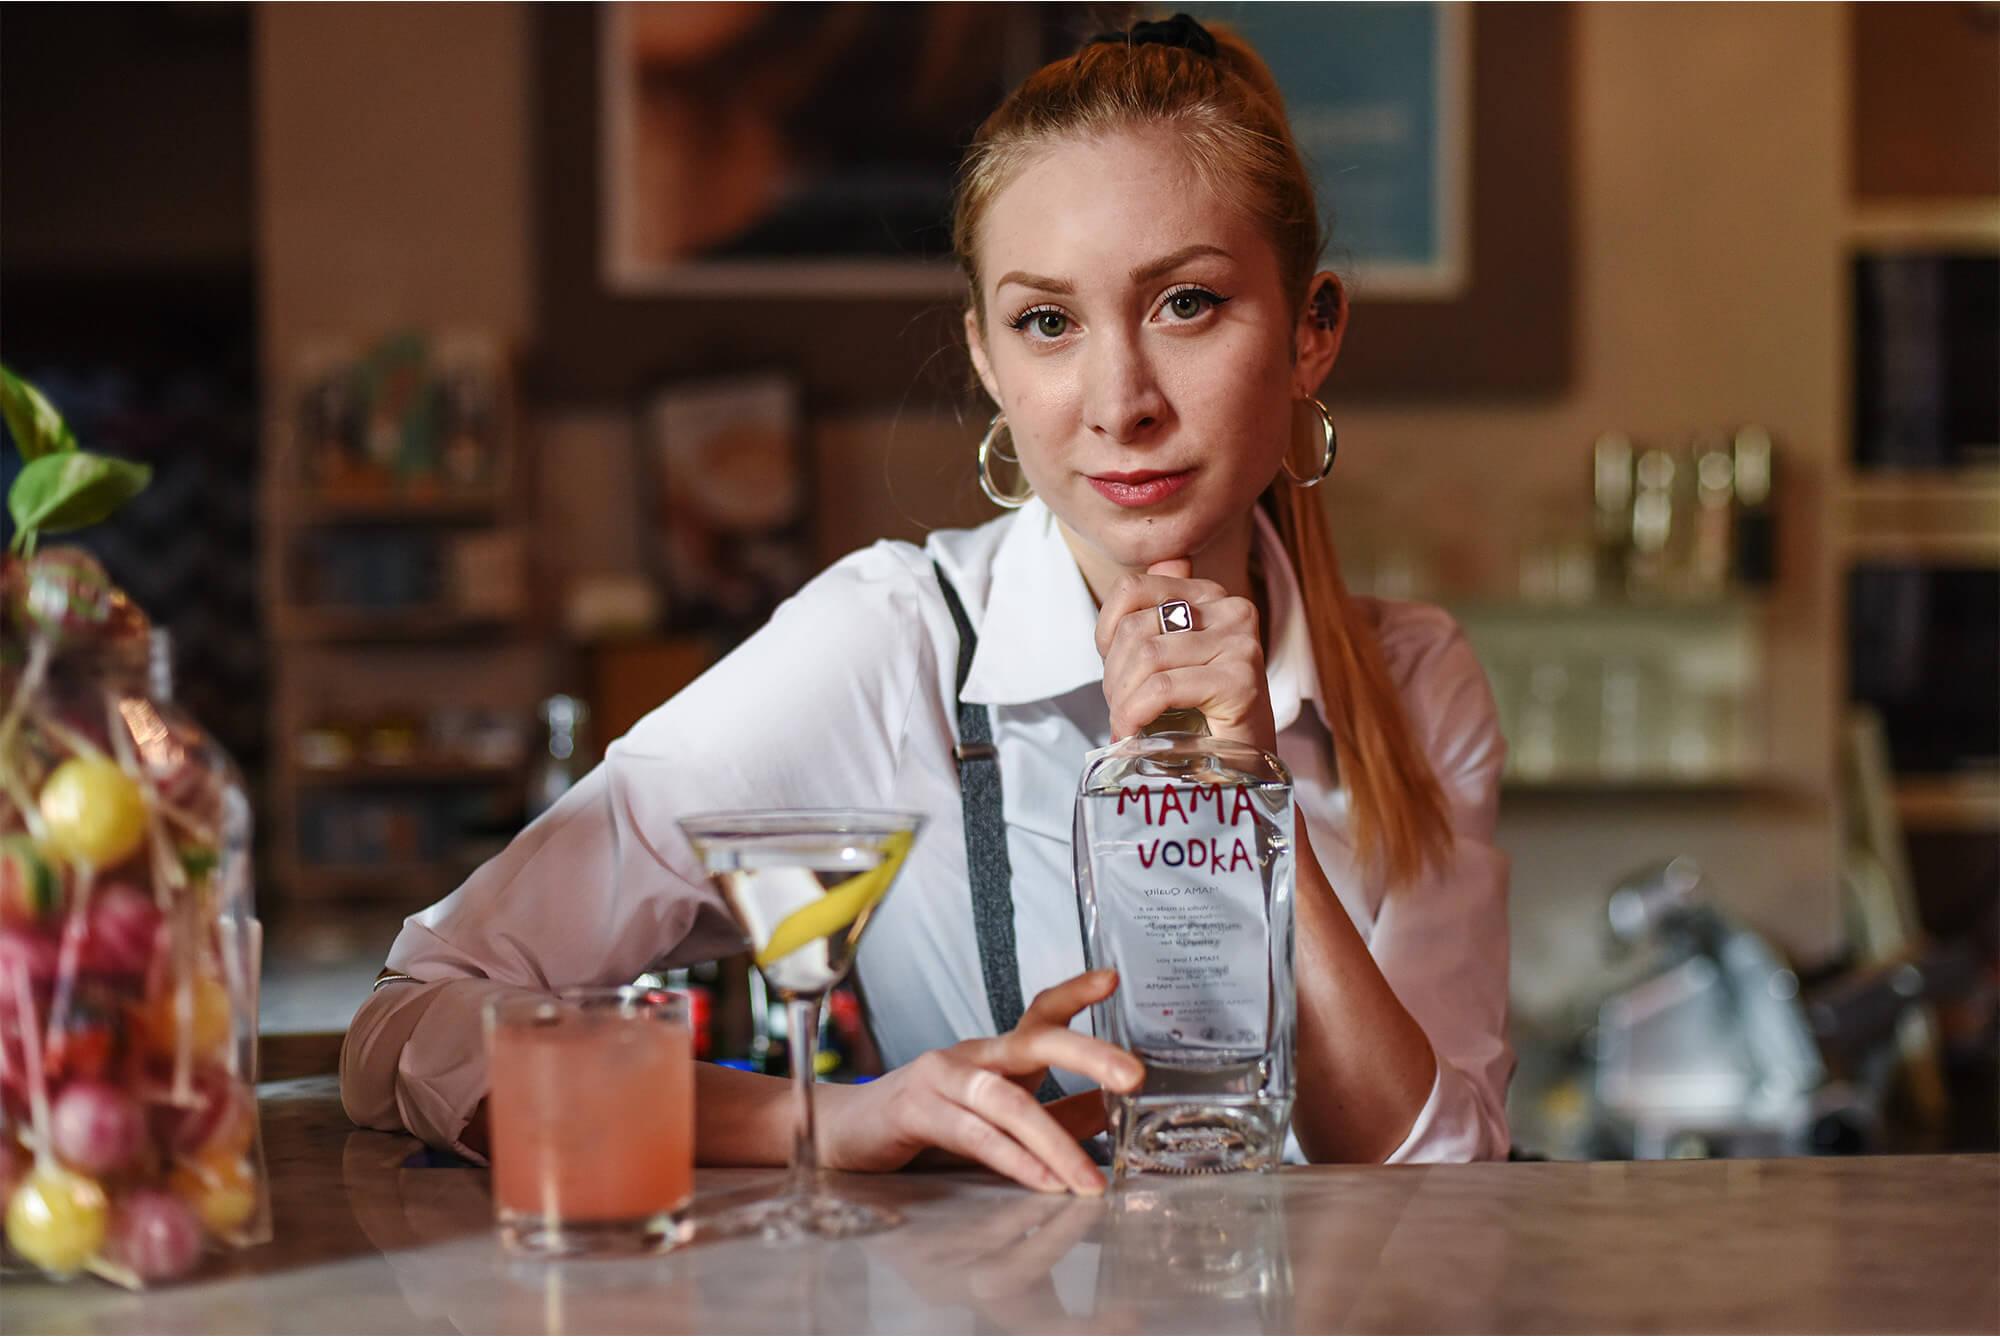 mamavodka bartender Il Cinemino